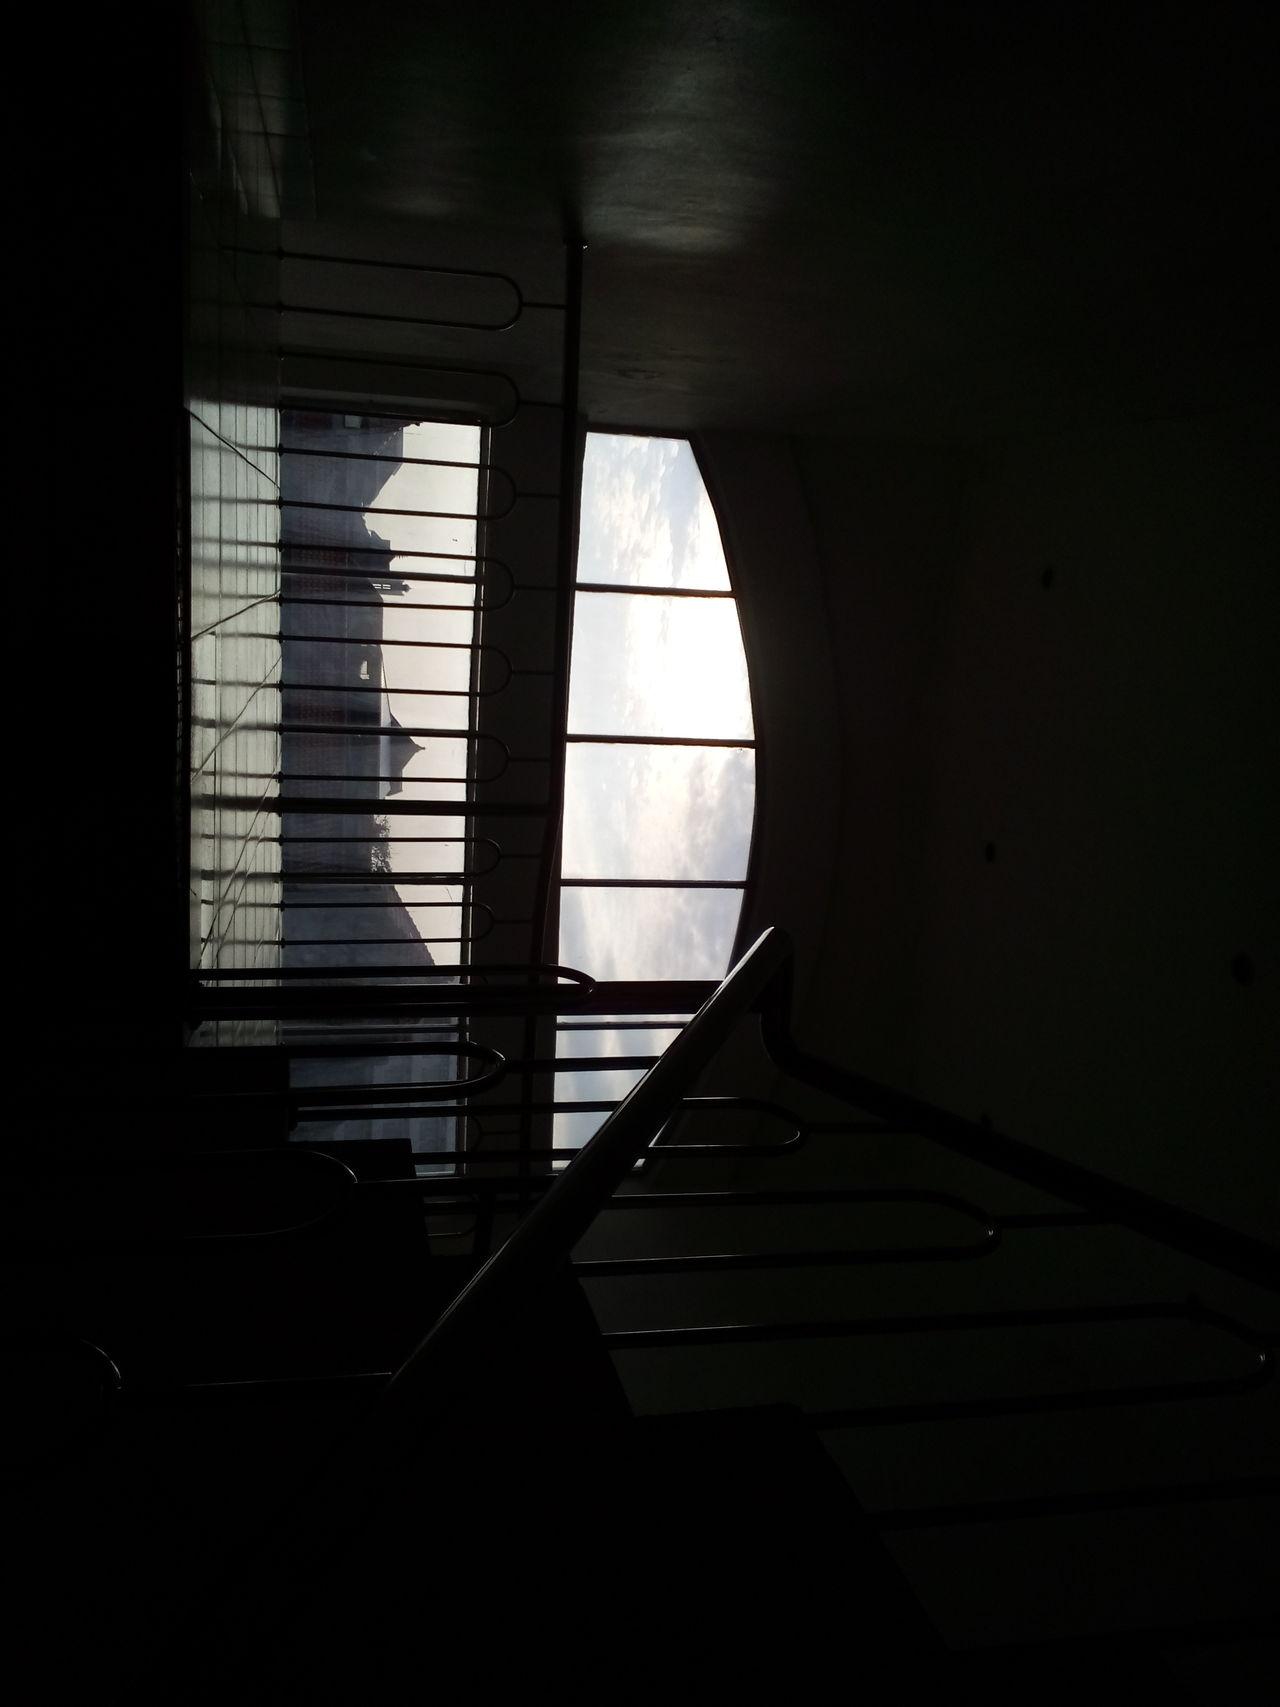 Minimalist Architecture Indoors  Window Architecture Classic Elegance Floors Portrait Photography Design